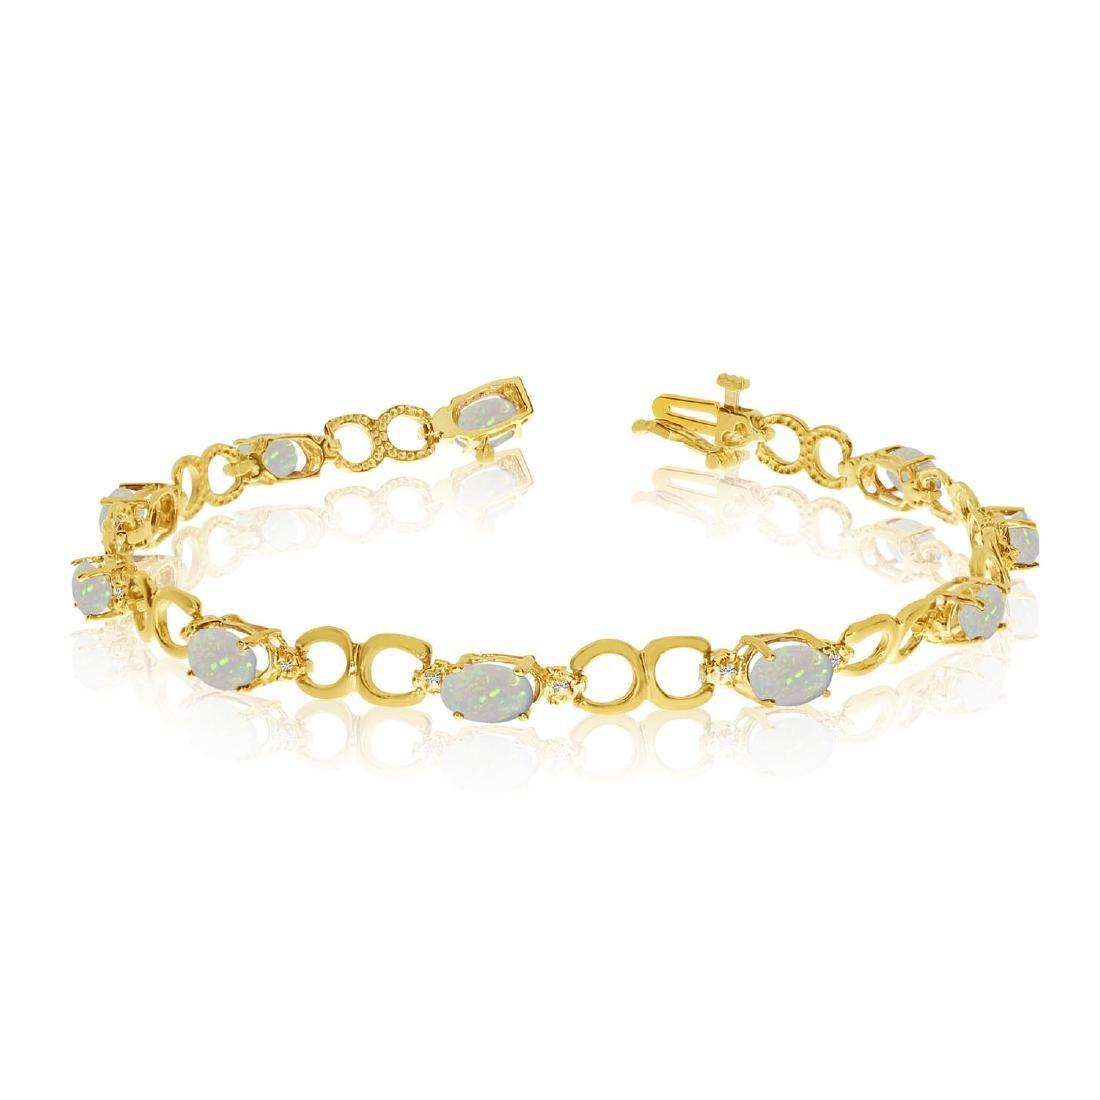 Certified 14K Yellow Gold Oval Opal and Diamond Bracele